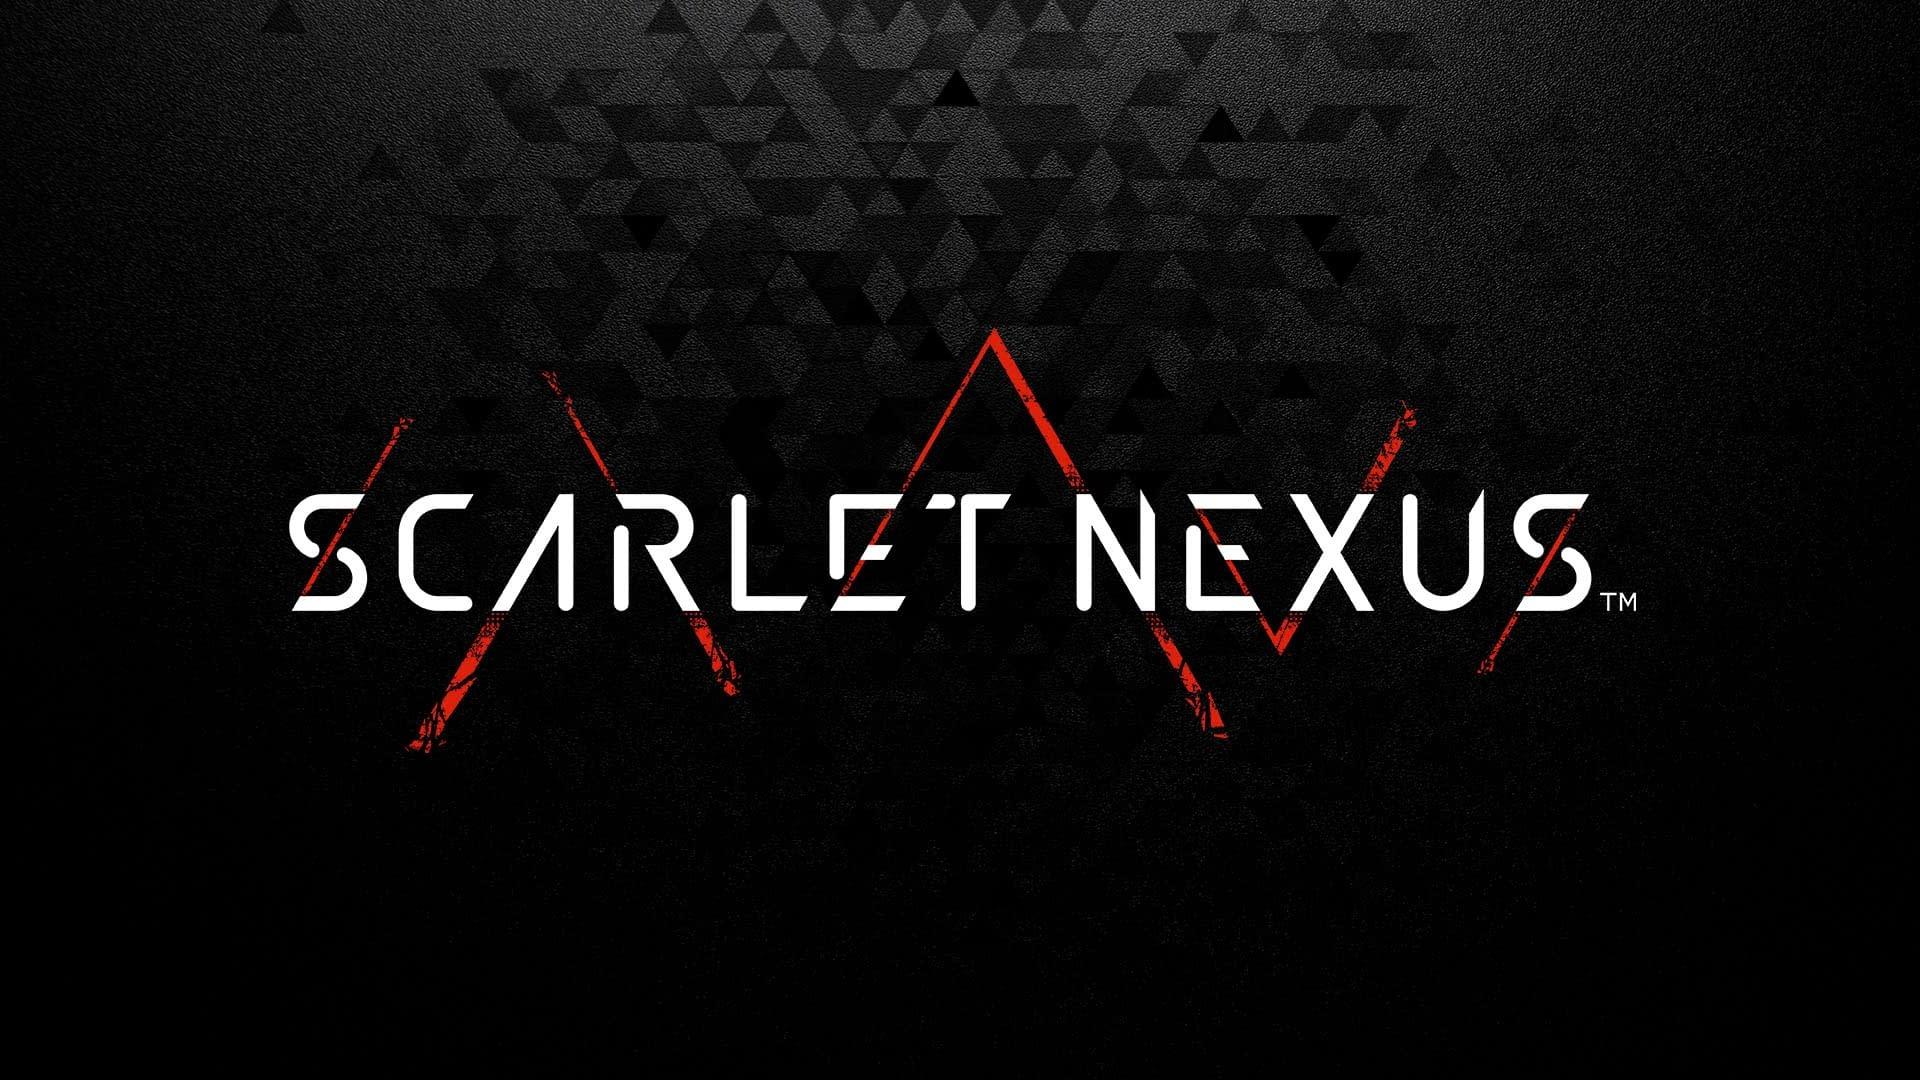 Scarlet Nexus windows wallpaper